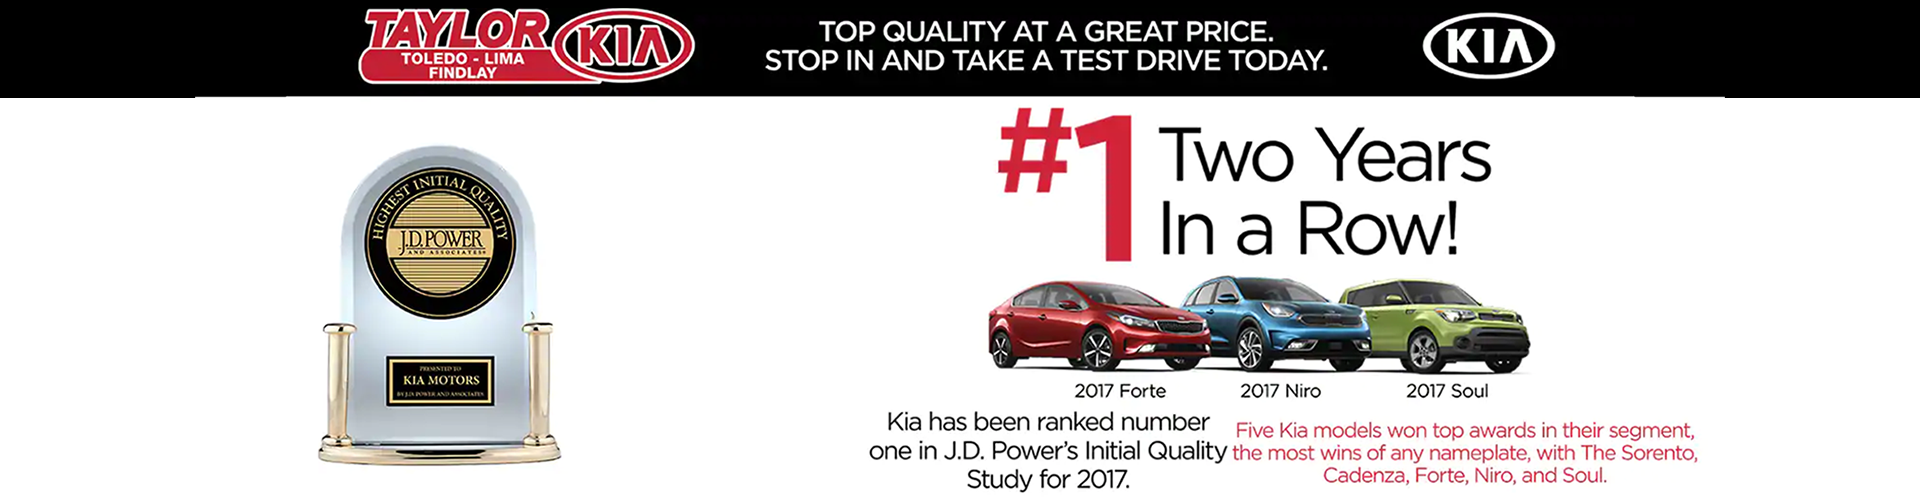 The Taylor Automotive Family Kia Banner